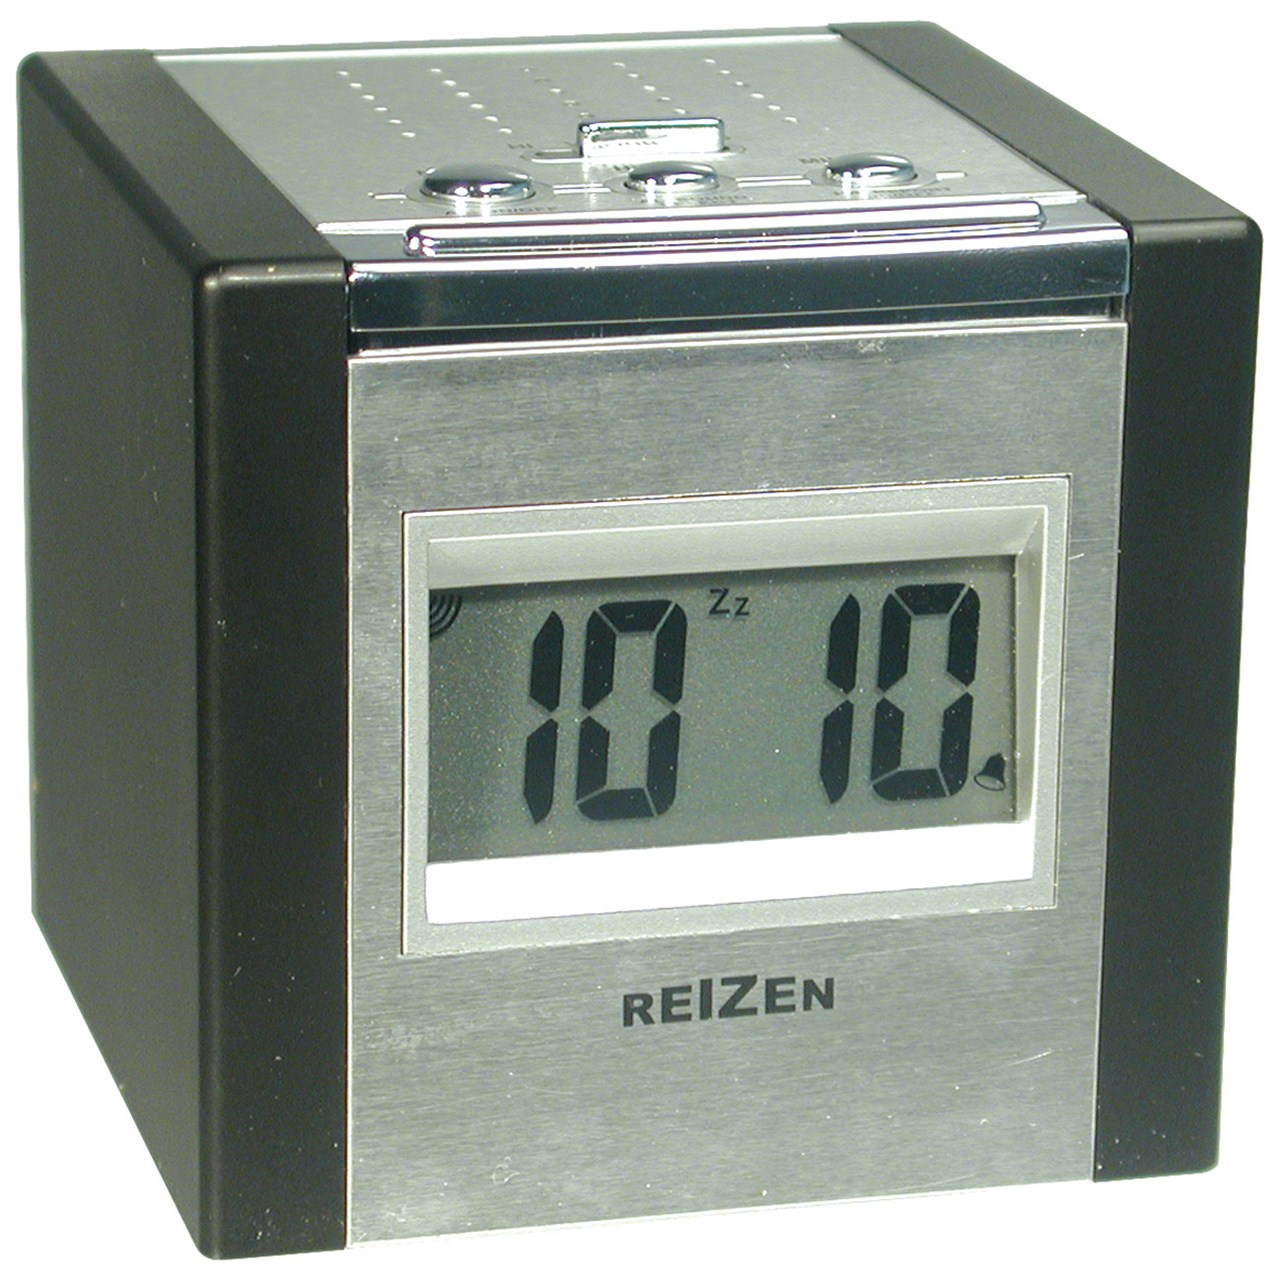 Reizen Talking LCD Alarm Cube Clock - Silver and Black